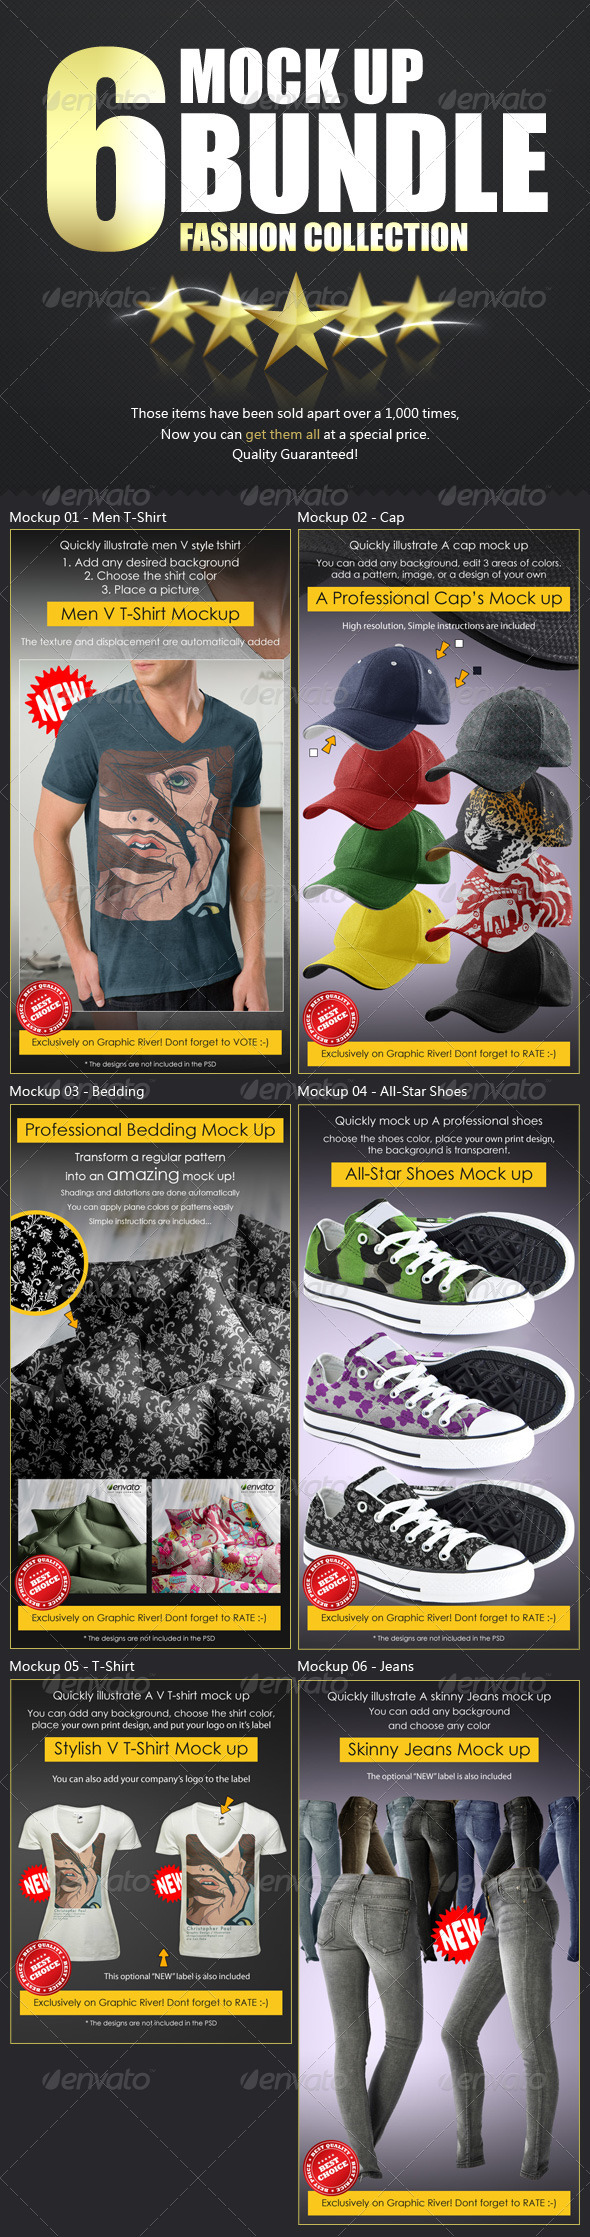 GraphicRiver Top x6 Mockup Bundle Fashion Collection 3594370